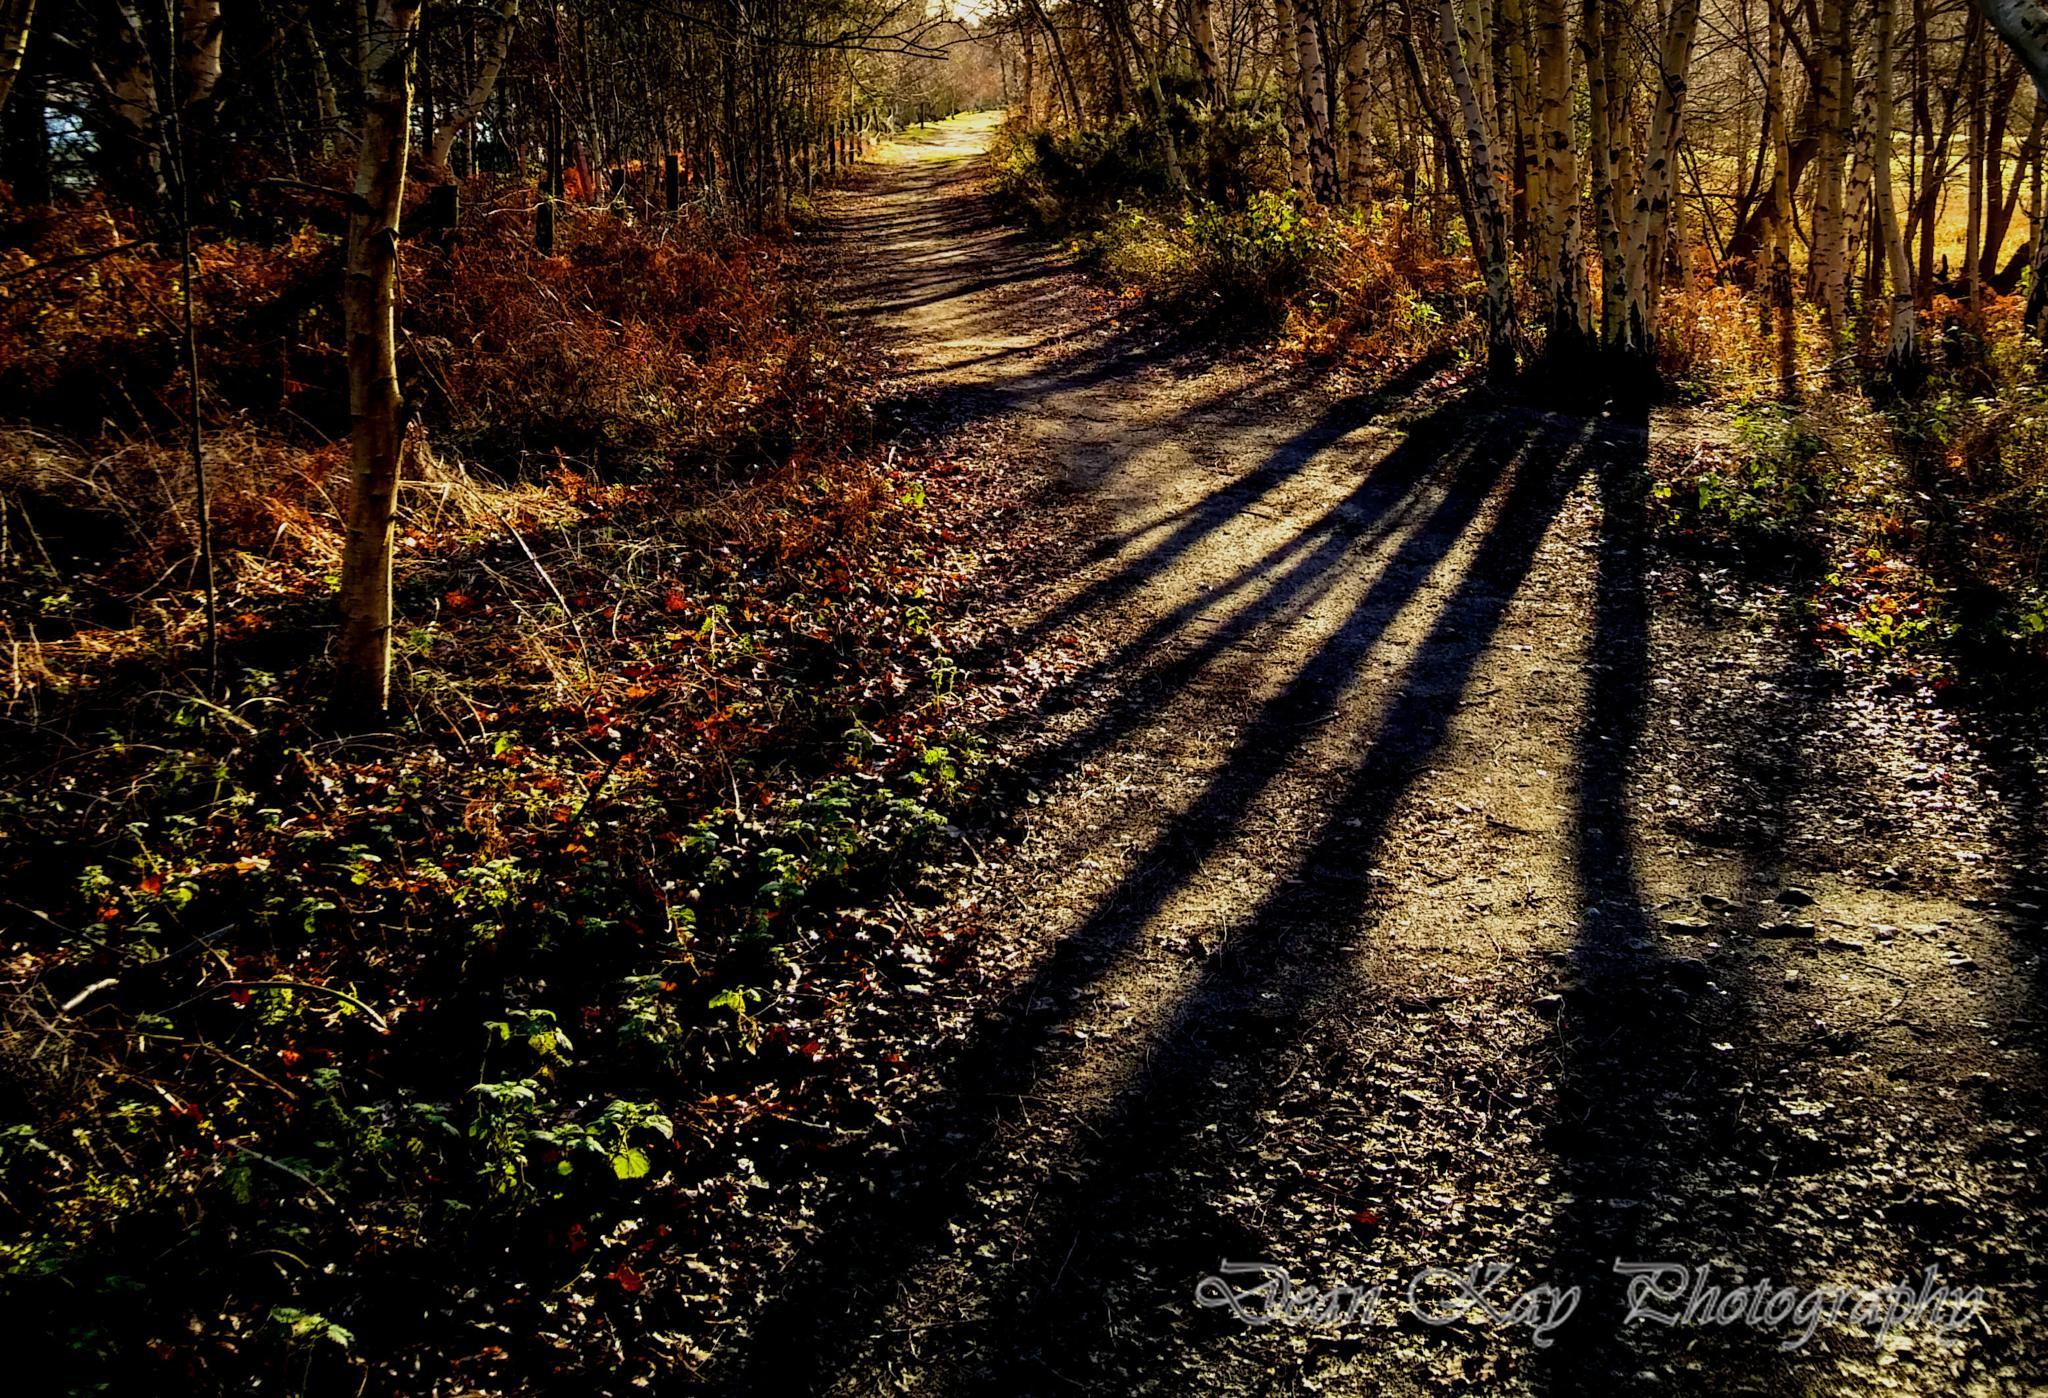 the hidden path by Dean kay